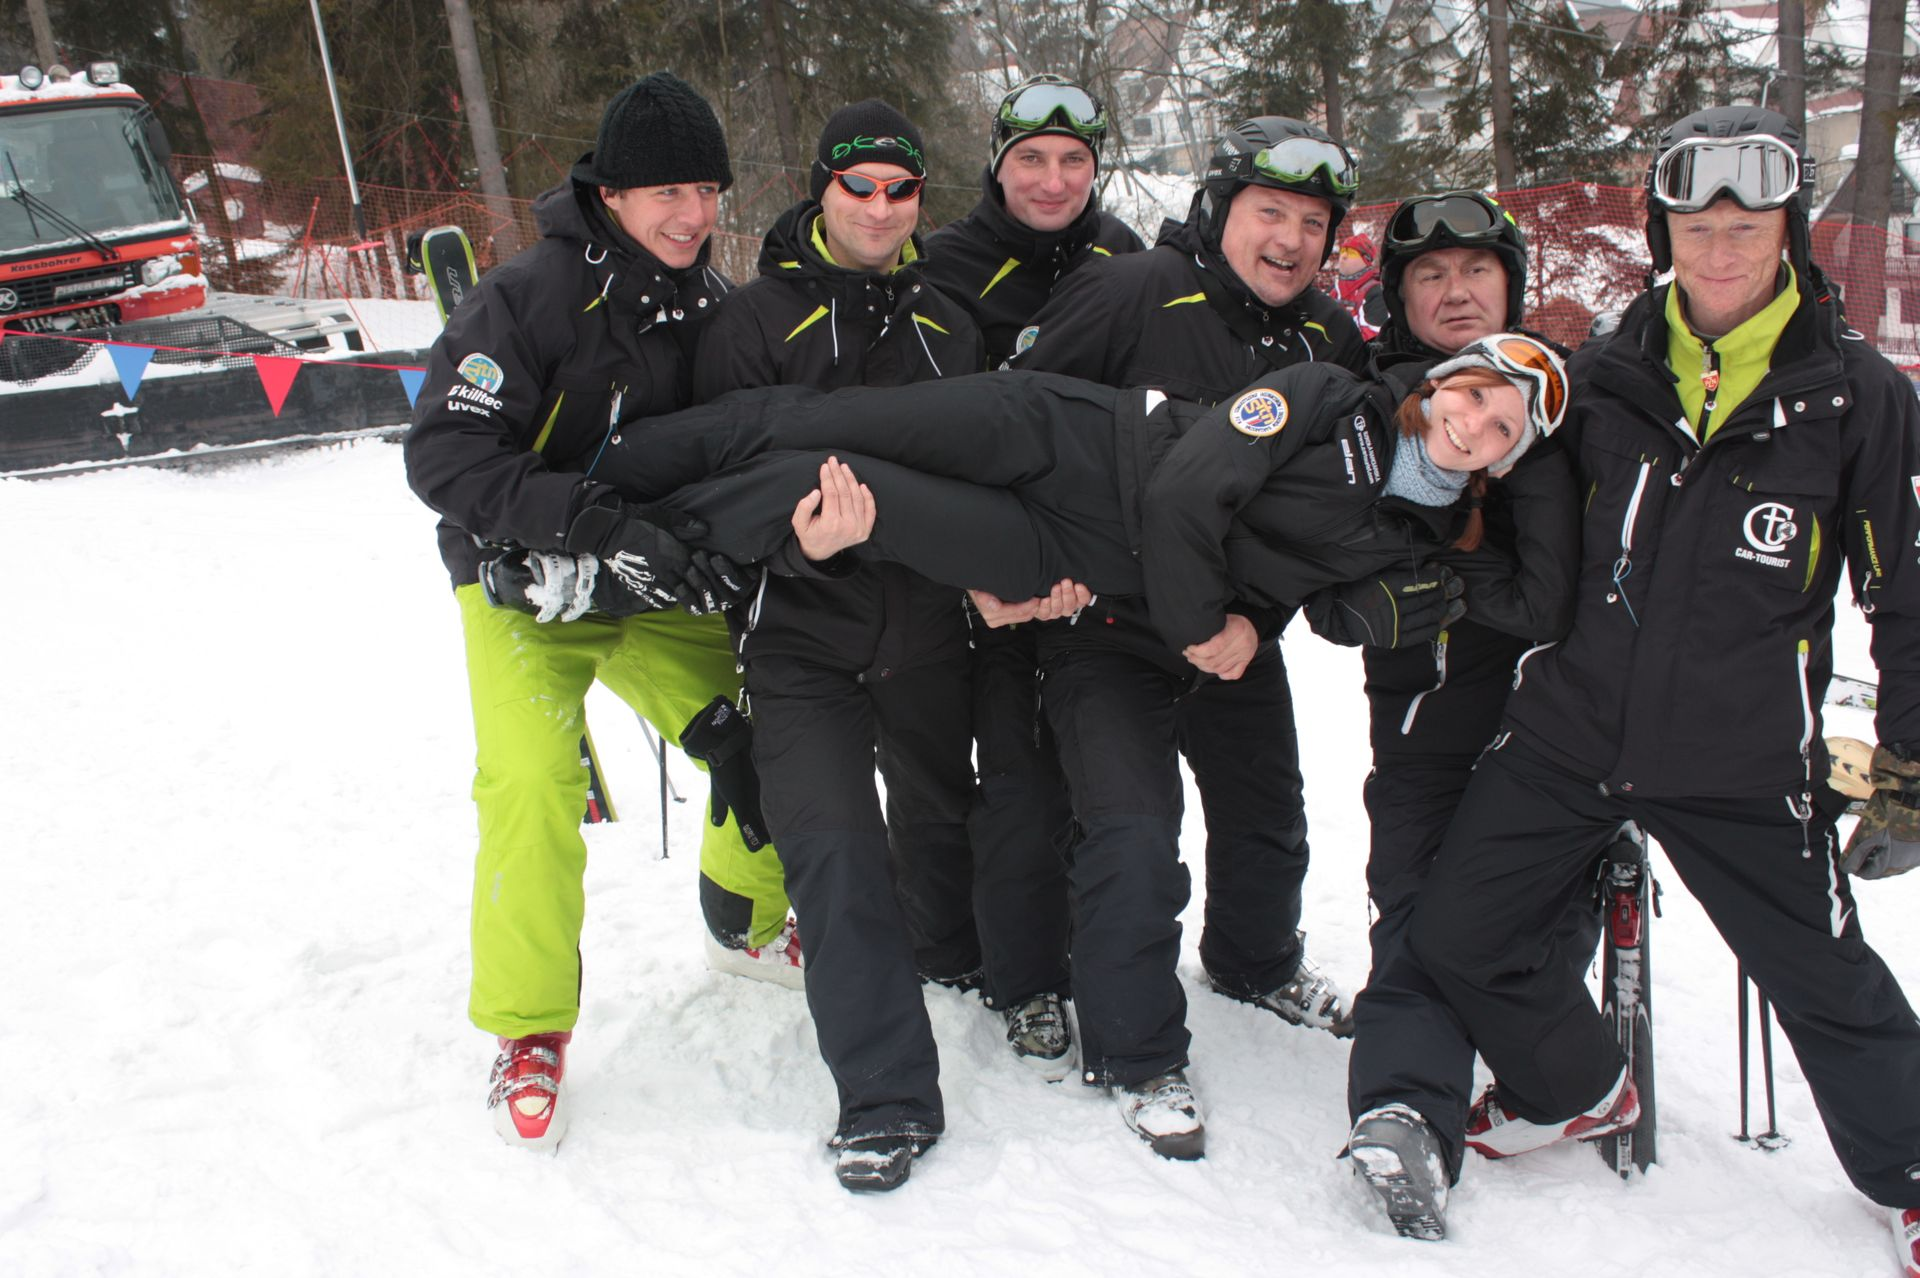 CarTourist_narty-snowboard_2012-foto-22